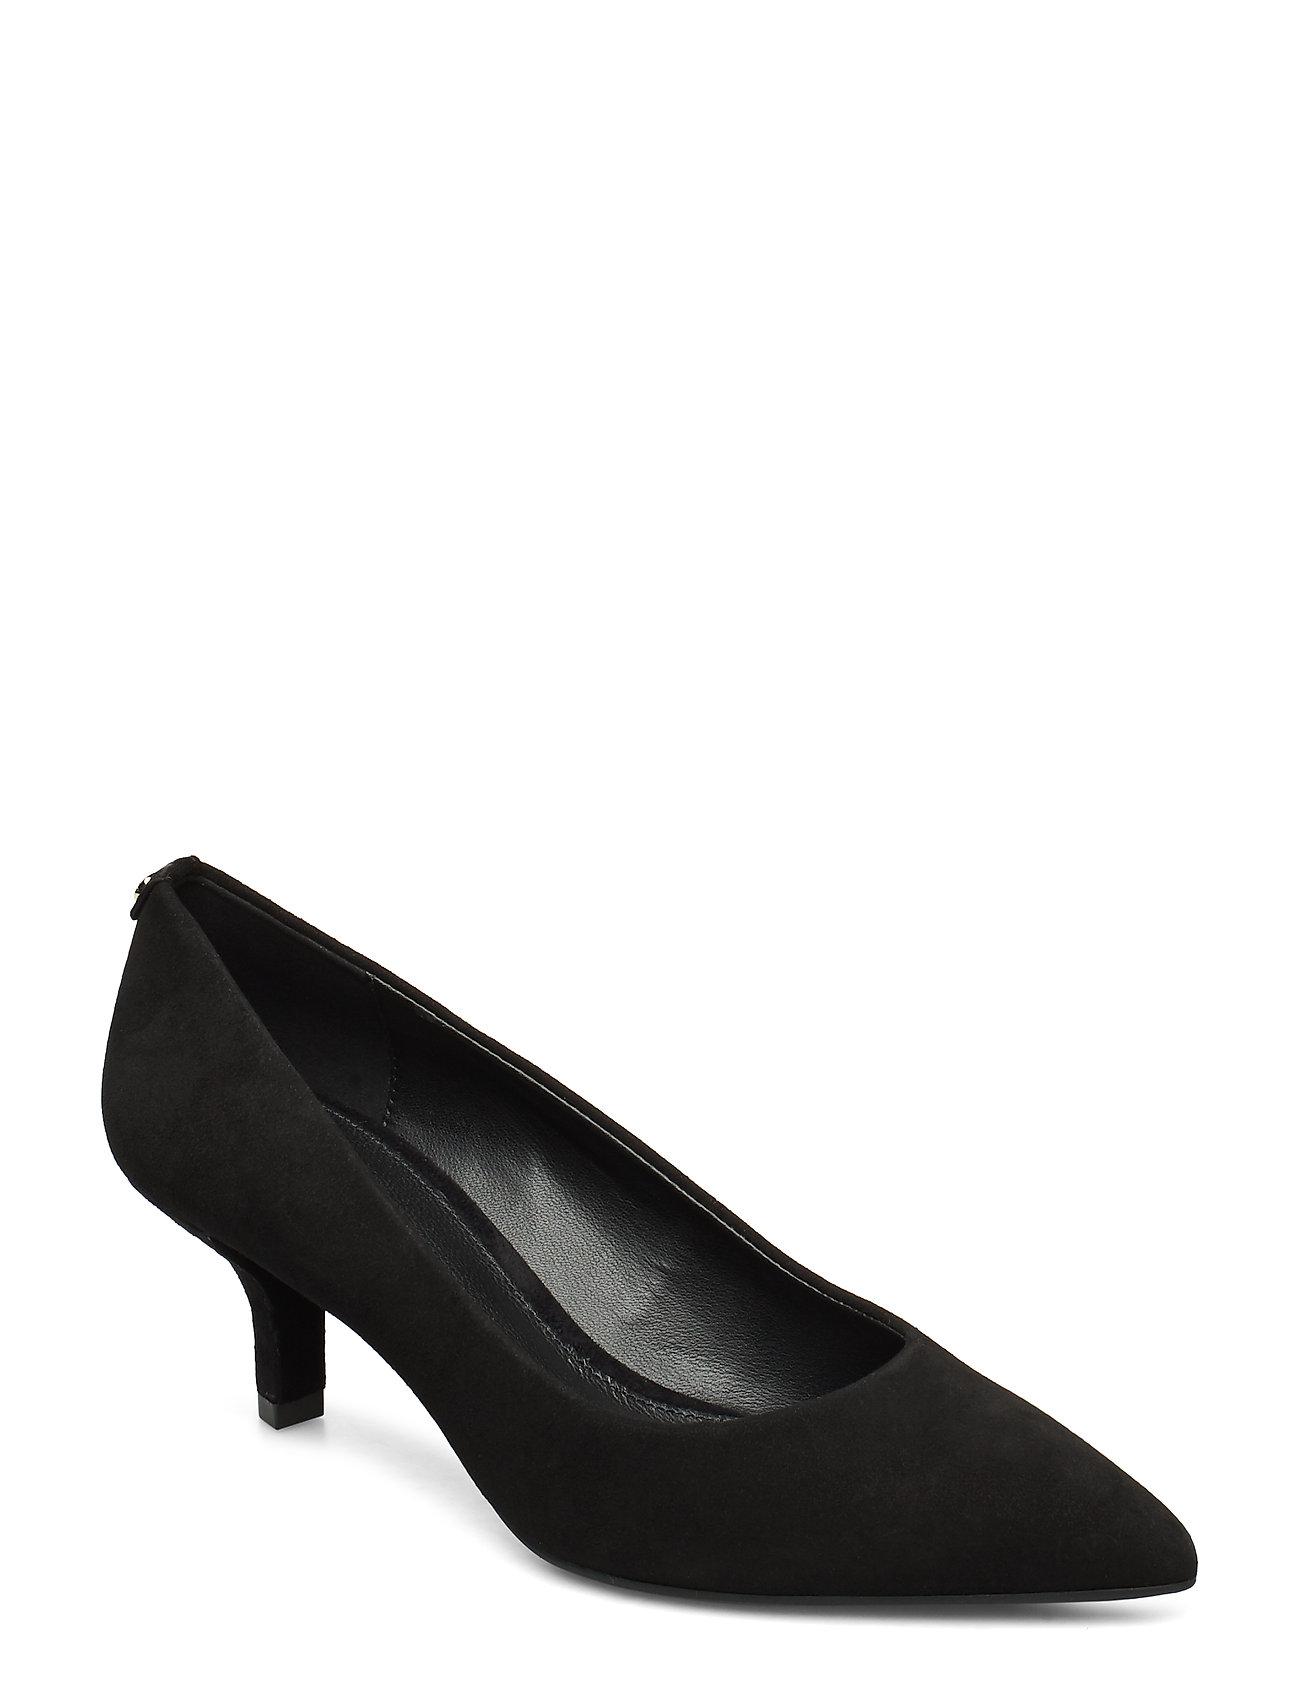 Michael Kors Shoes KATERINA FLEX KITTEN PUMP - BLACK